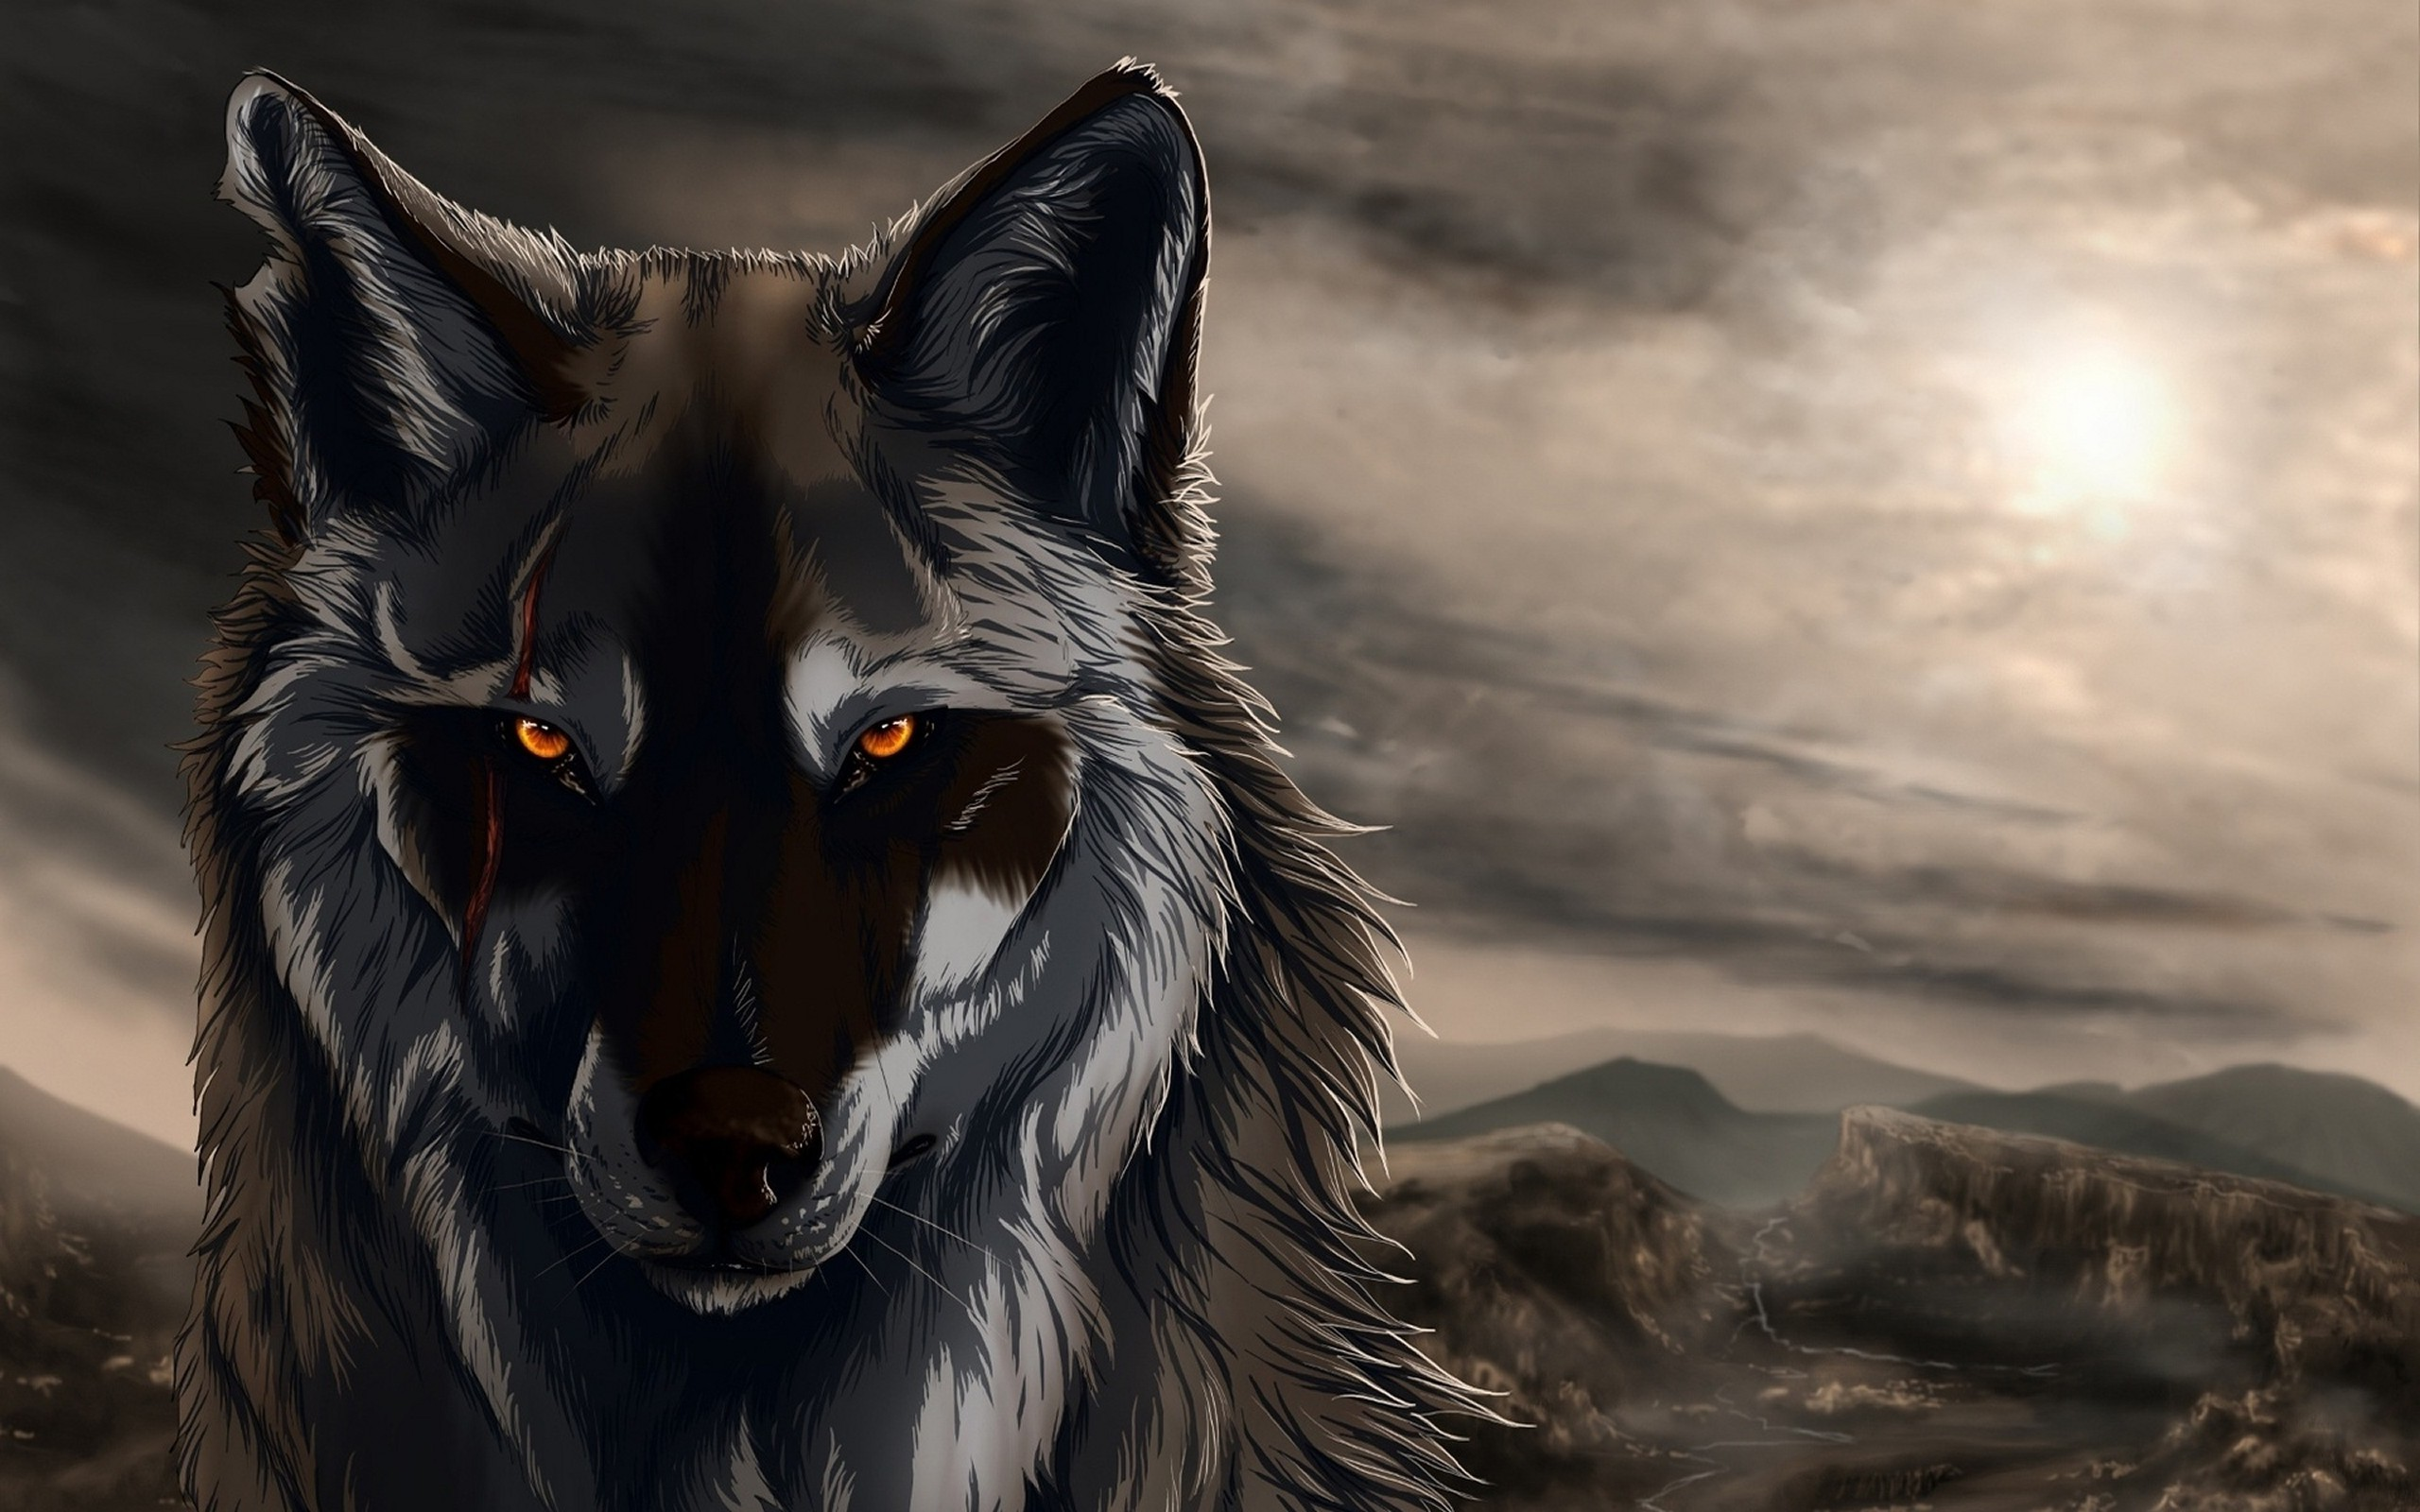 213 2132297 wolf artwork digital art animals wallpapers hd digital